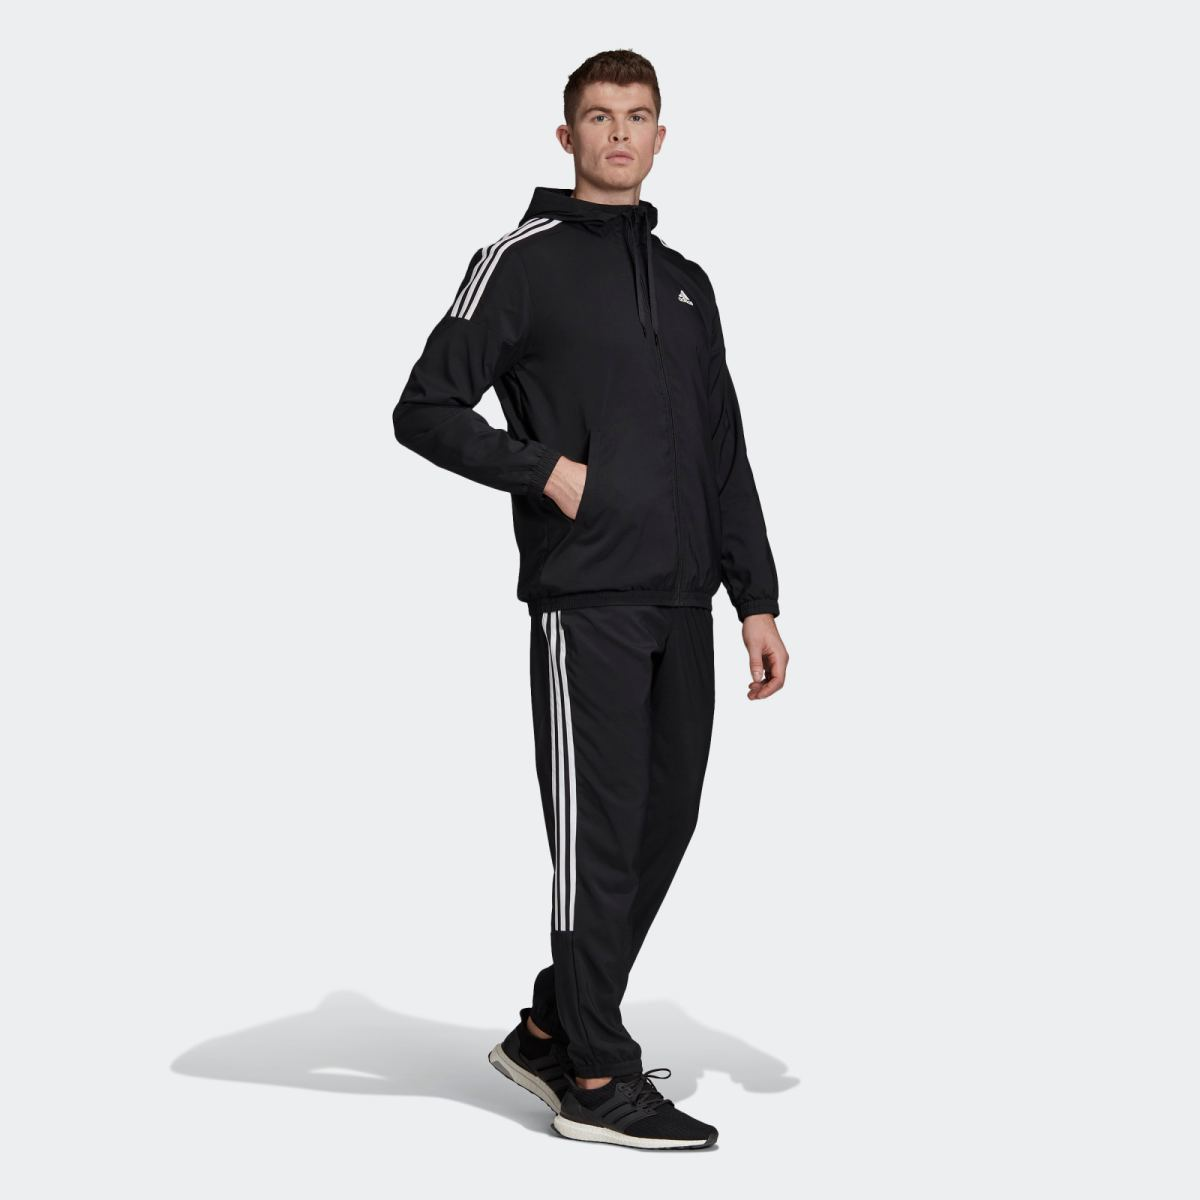 Track_Suit_Black_EB7651_25_model